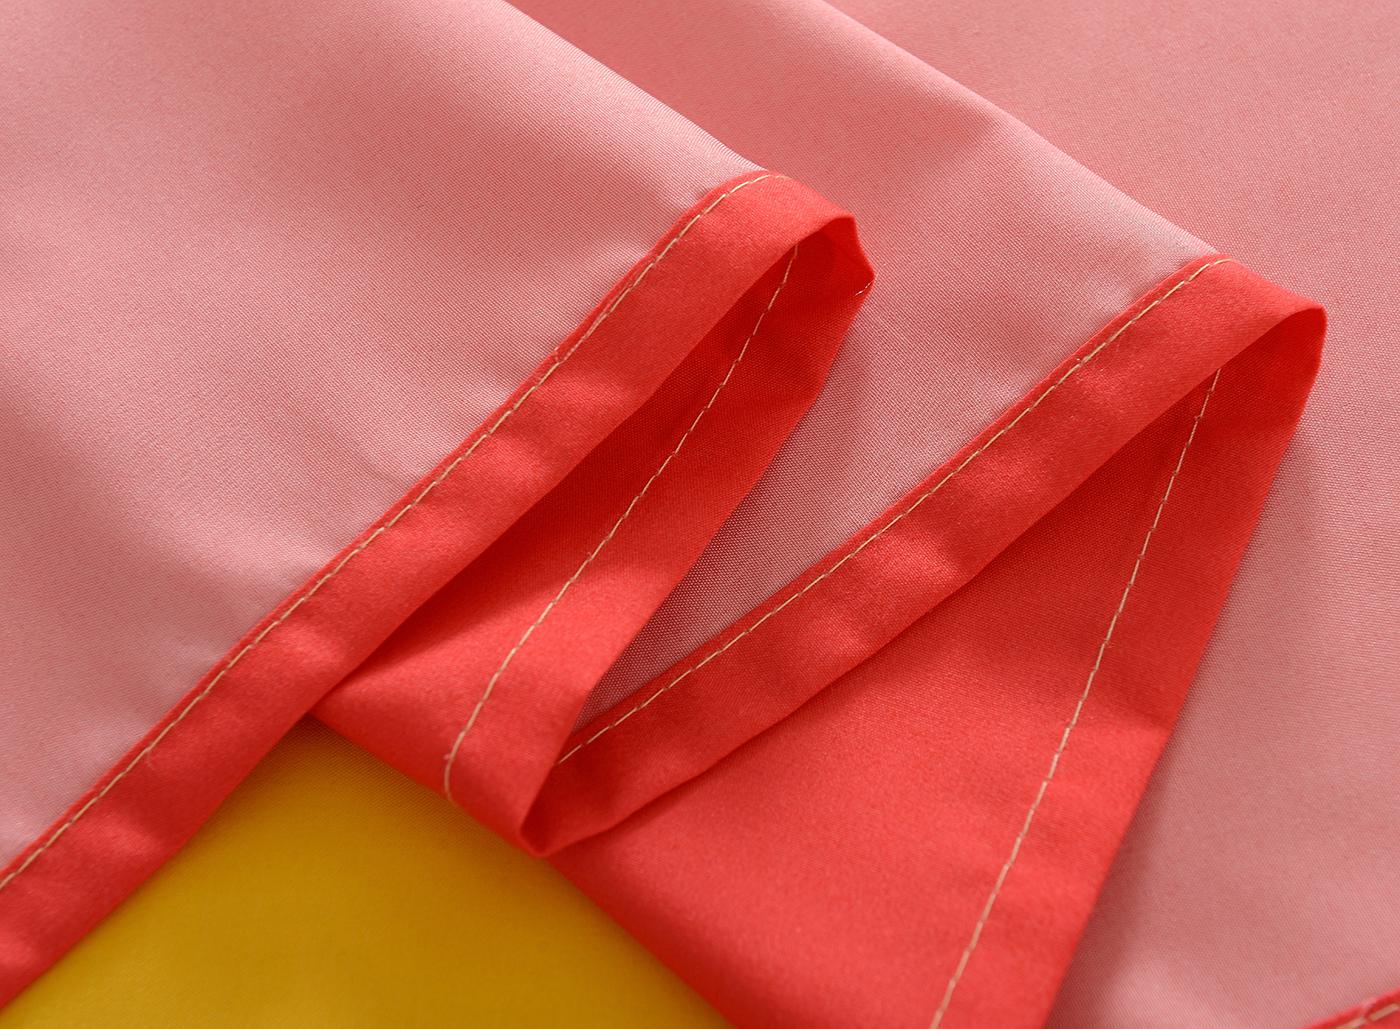 gardine vorhang senschal spanien flagge 245x140 hxb fu ball wm 2014 ebay. Black Bedroom Furniture Sets. Home Design Ideas